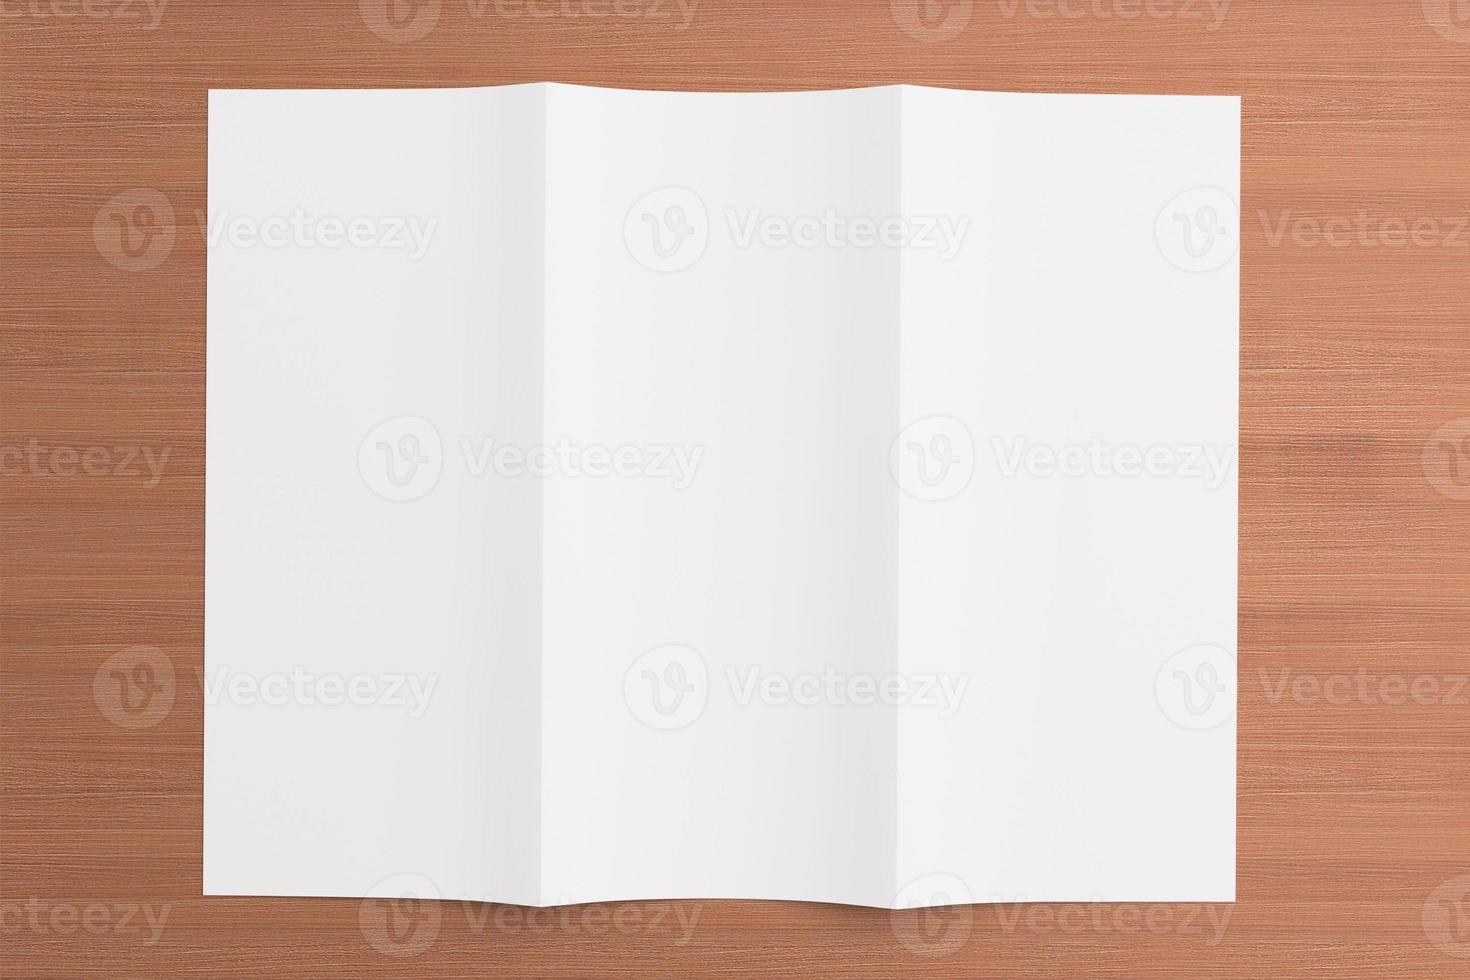 lege gevouwen brochure op houten achtergrond foto